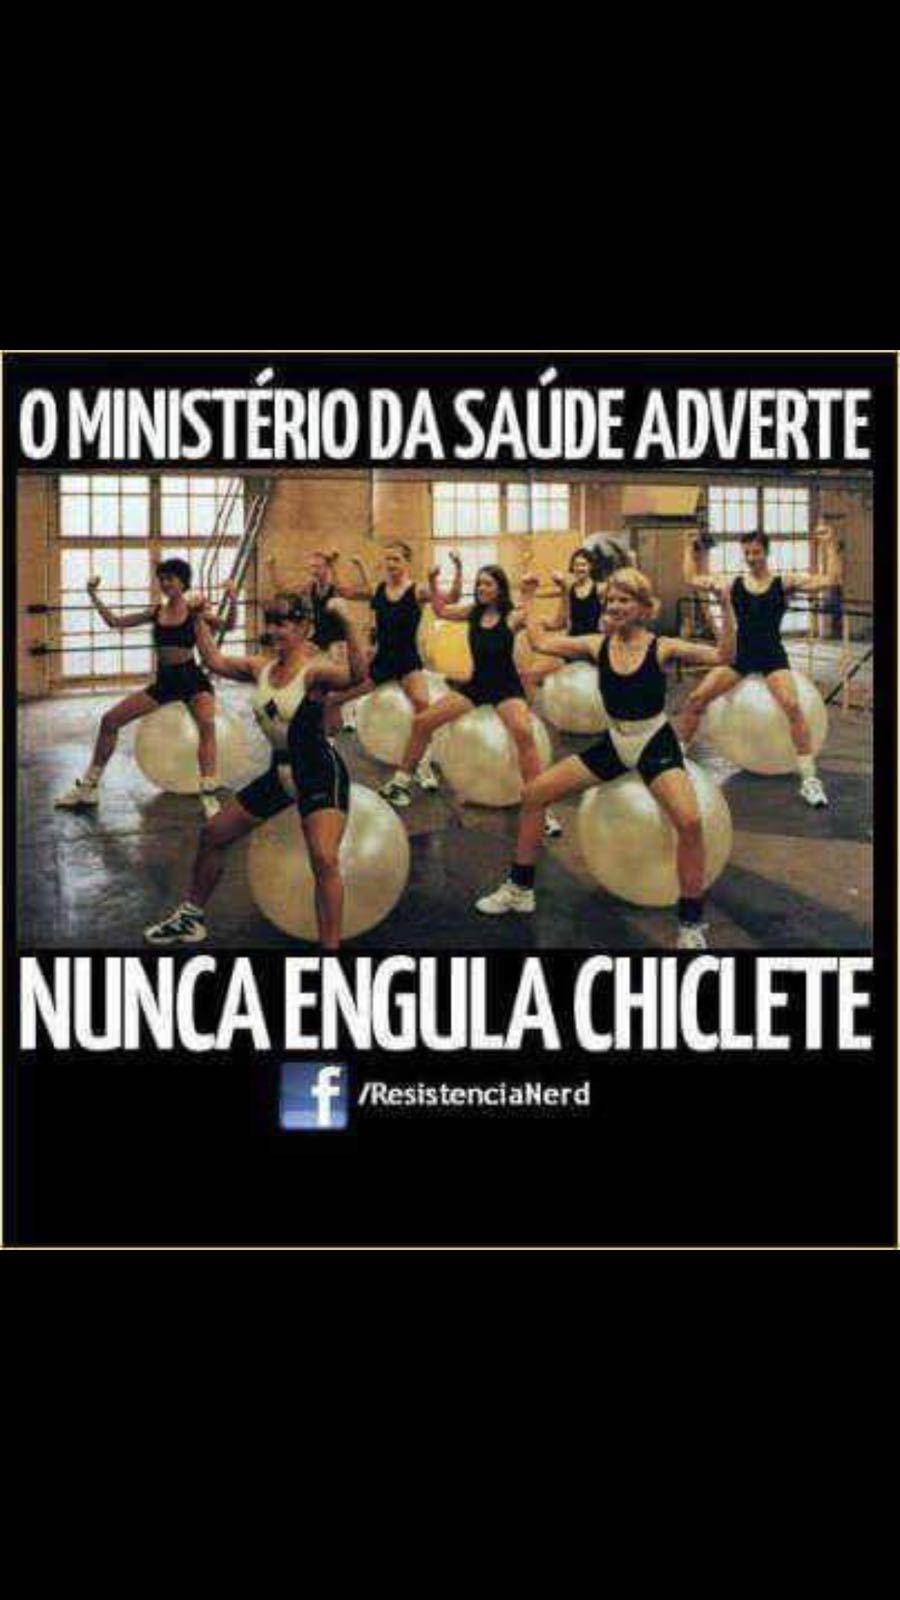 Ministerio - meme